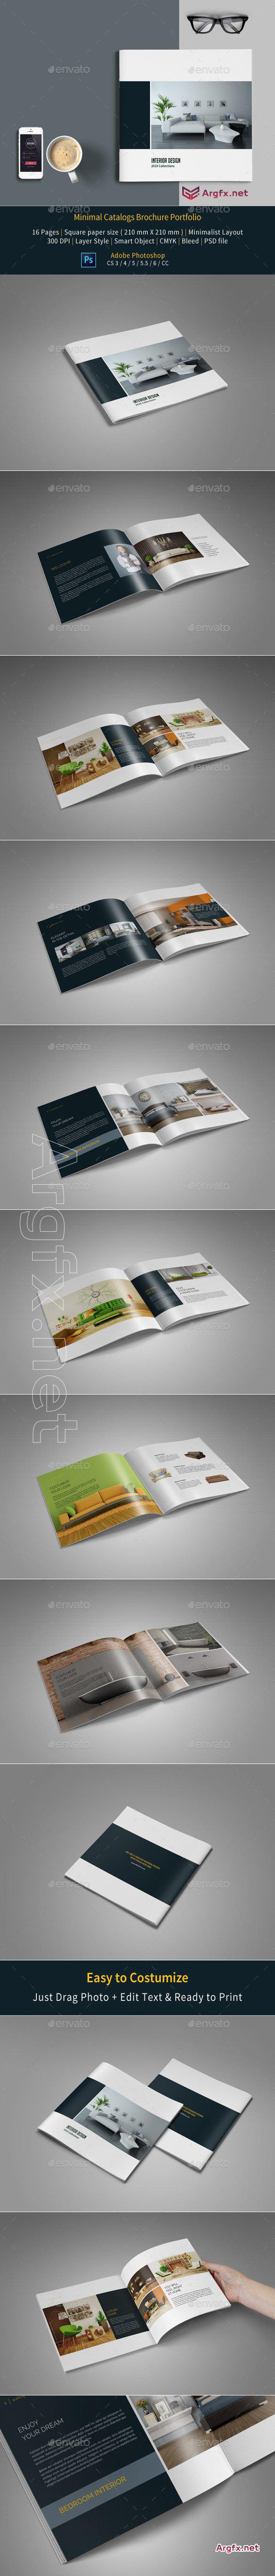 Portfolio Brochure Template 18483528